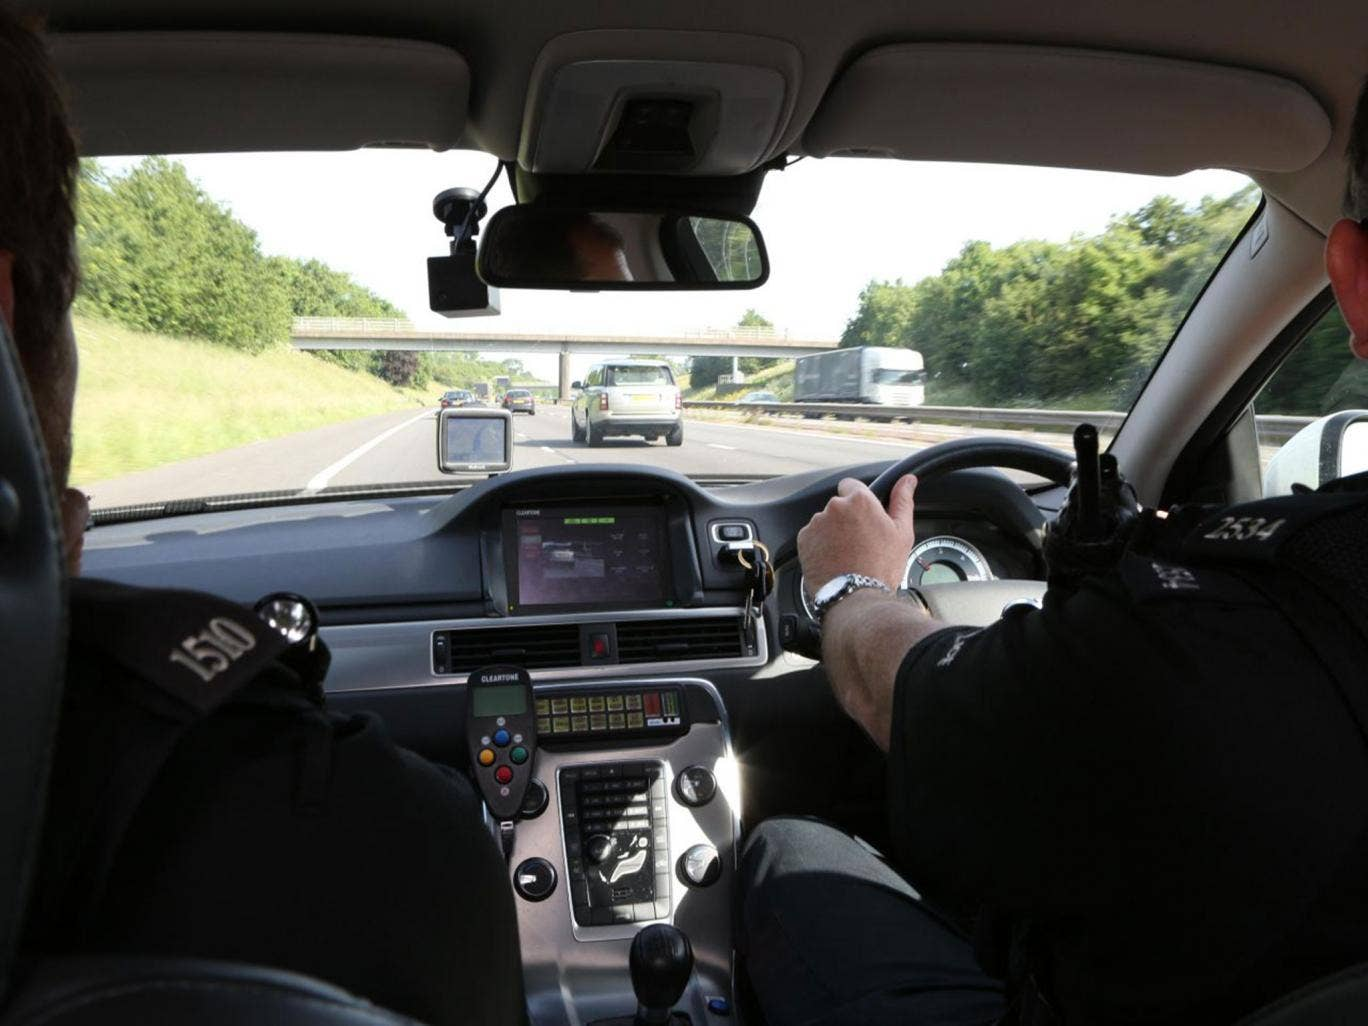 Thames Valley on patrol